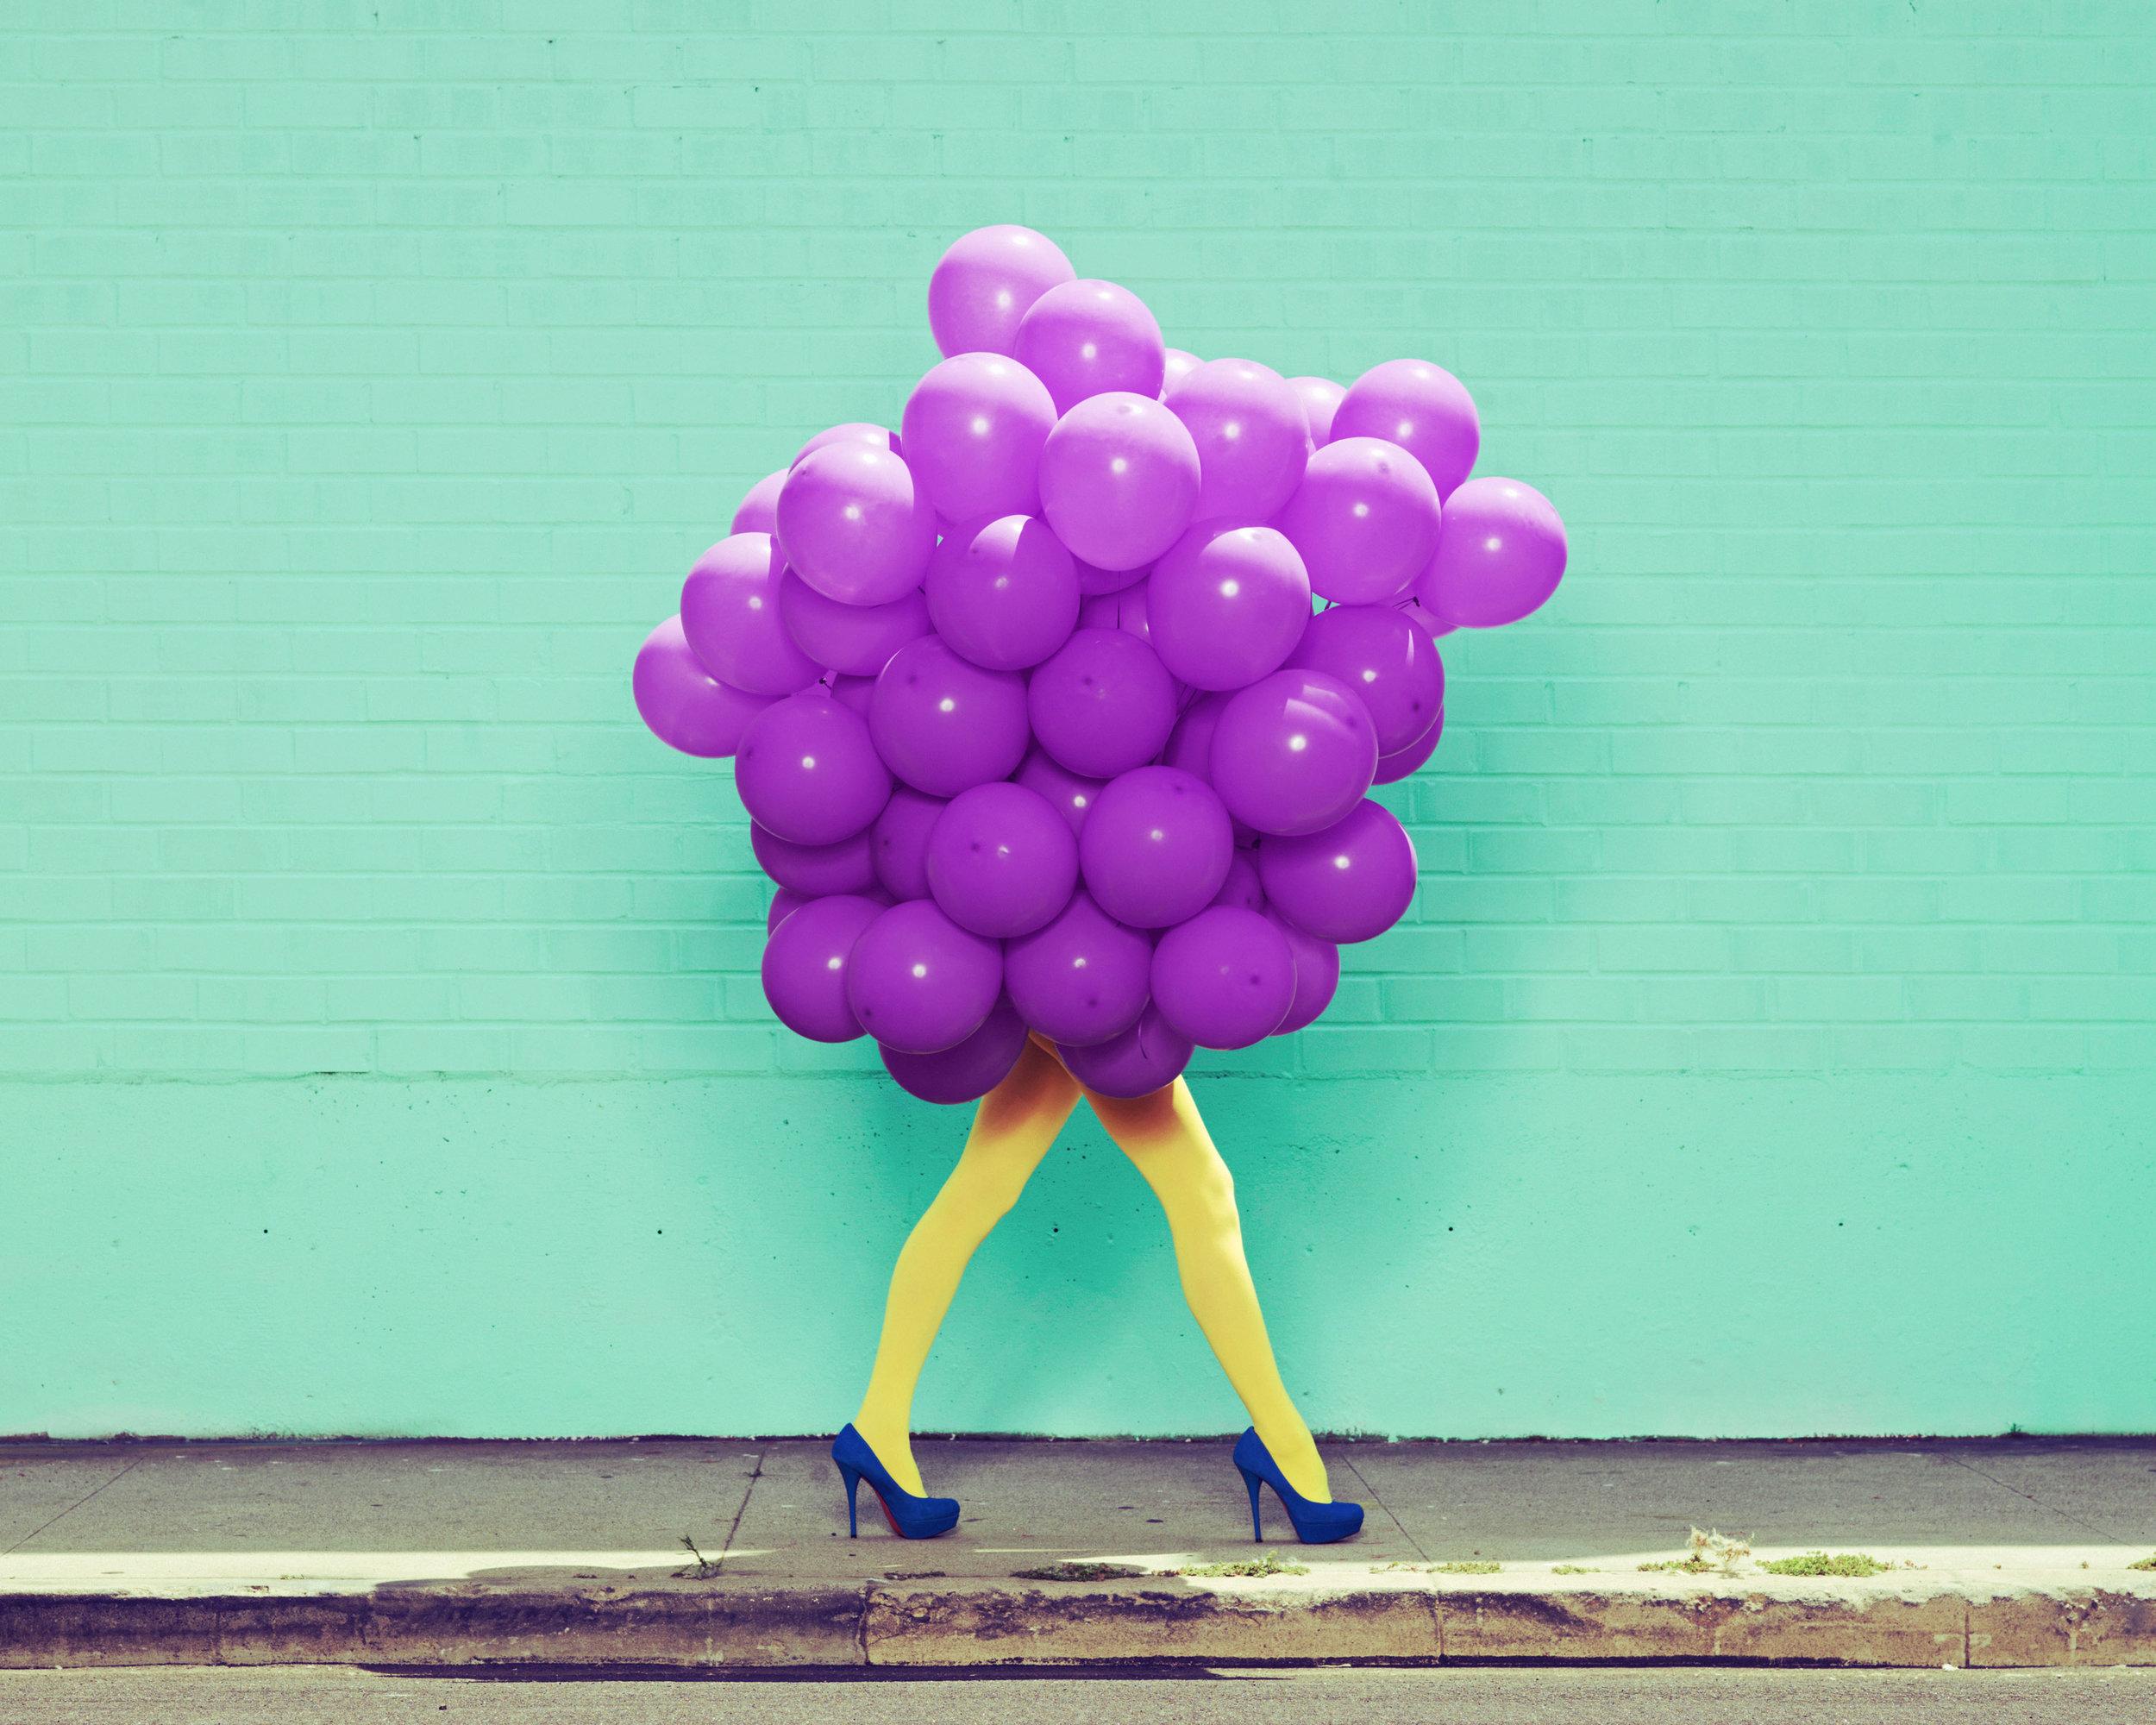 Ramona Rosales,  Je Ne Suis Pas Seul Sans Toi (Purple Balloons) , 2013  Digital pigment print, 30 x 40 in, edition of 5; 20 x 24 in, edition of 5; 8 x 10 in, edition of 250   Inquire